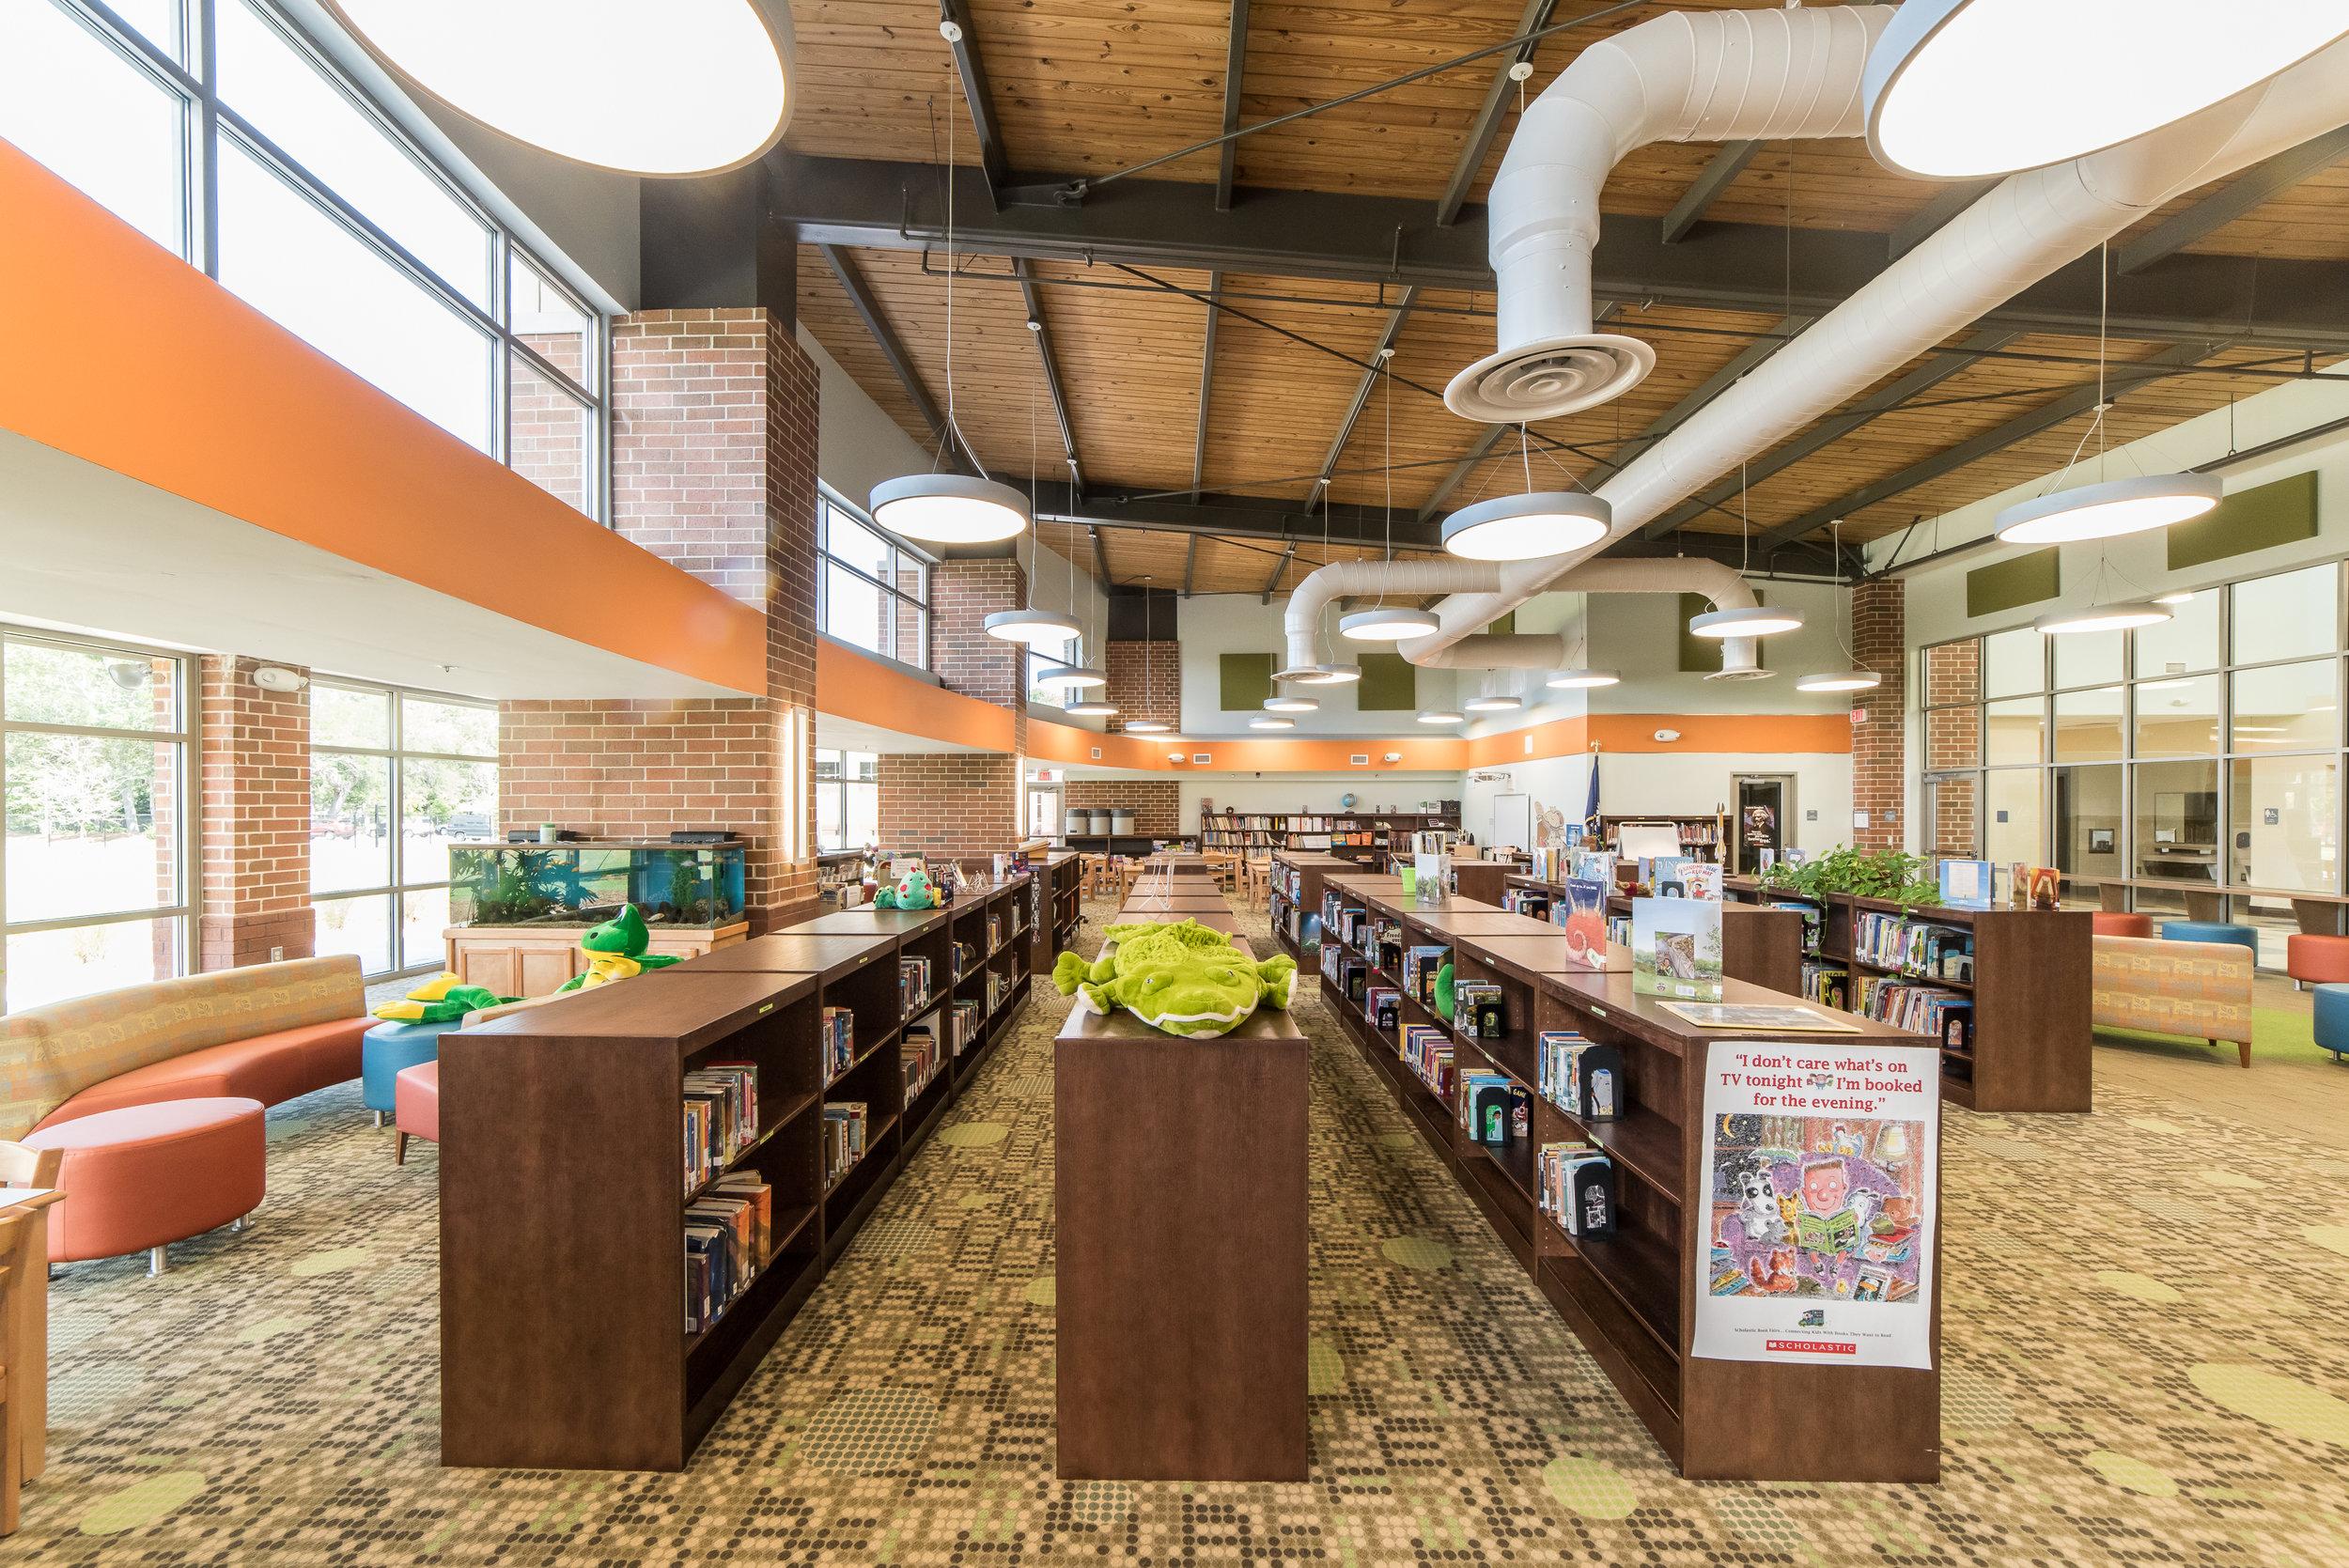 Springfield Elementary - Commons Bldg